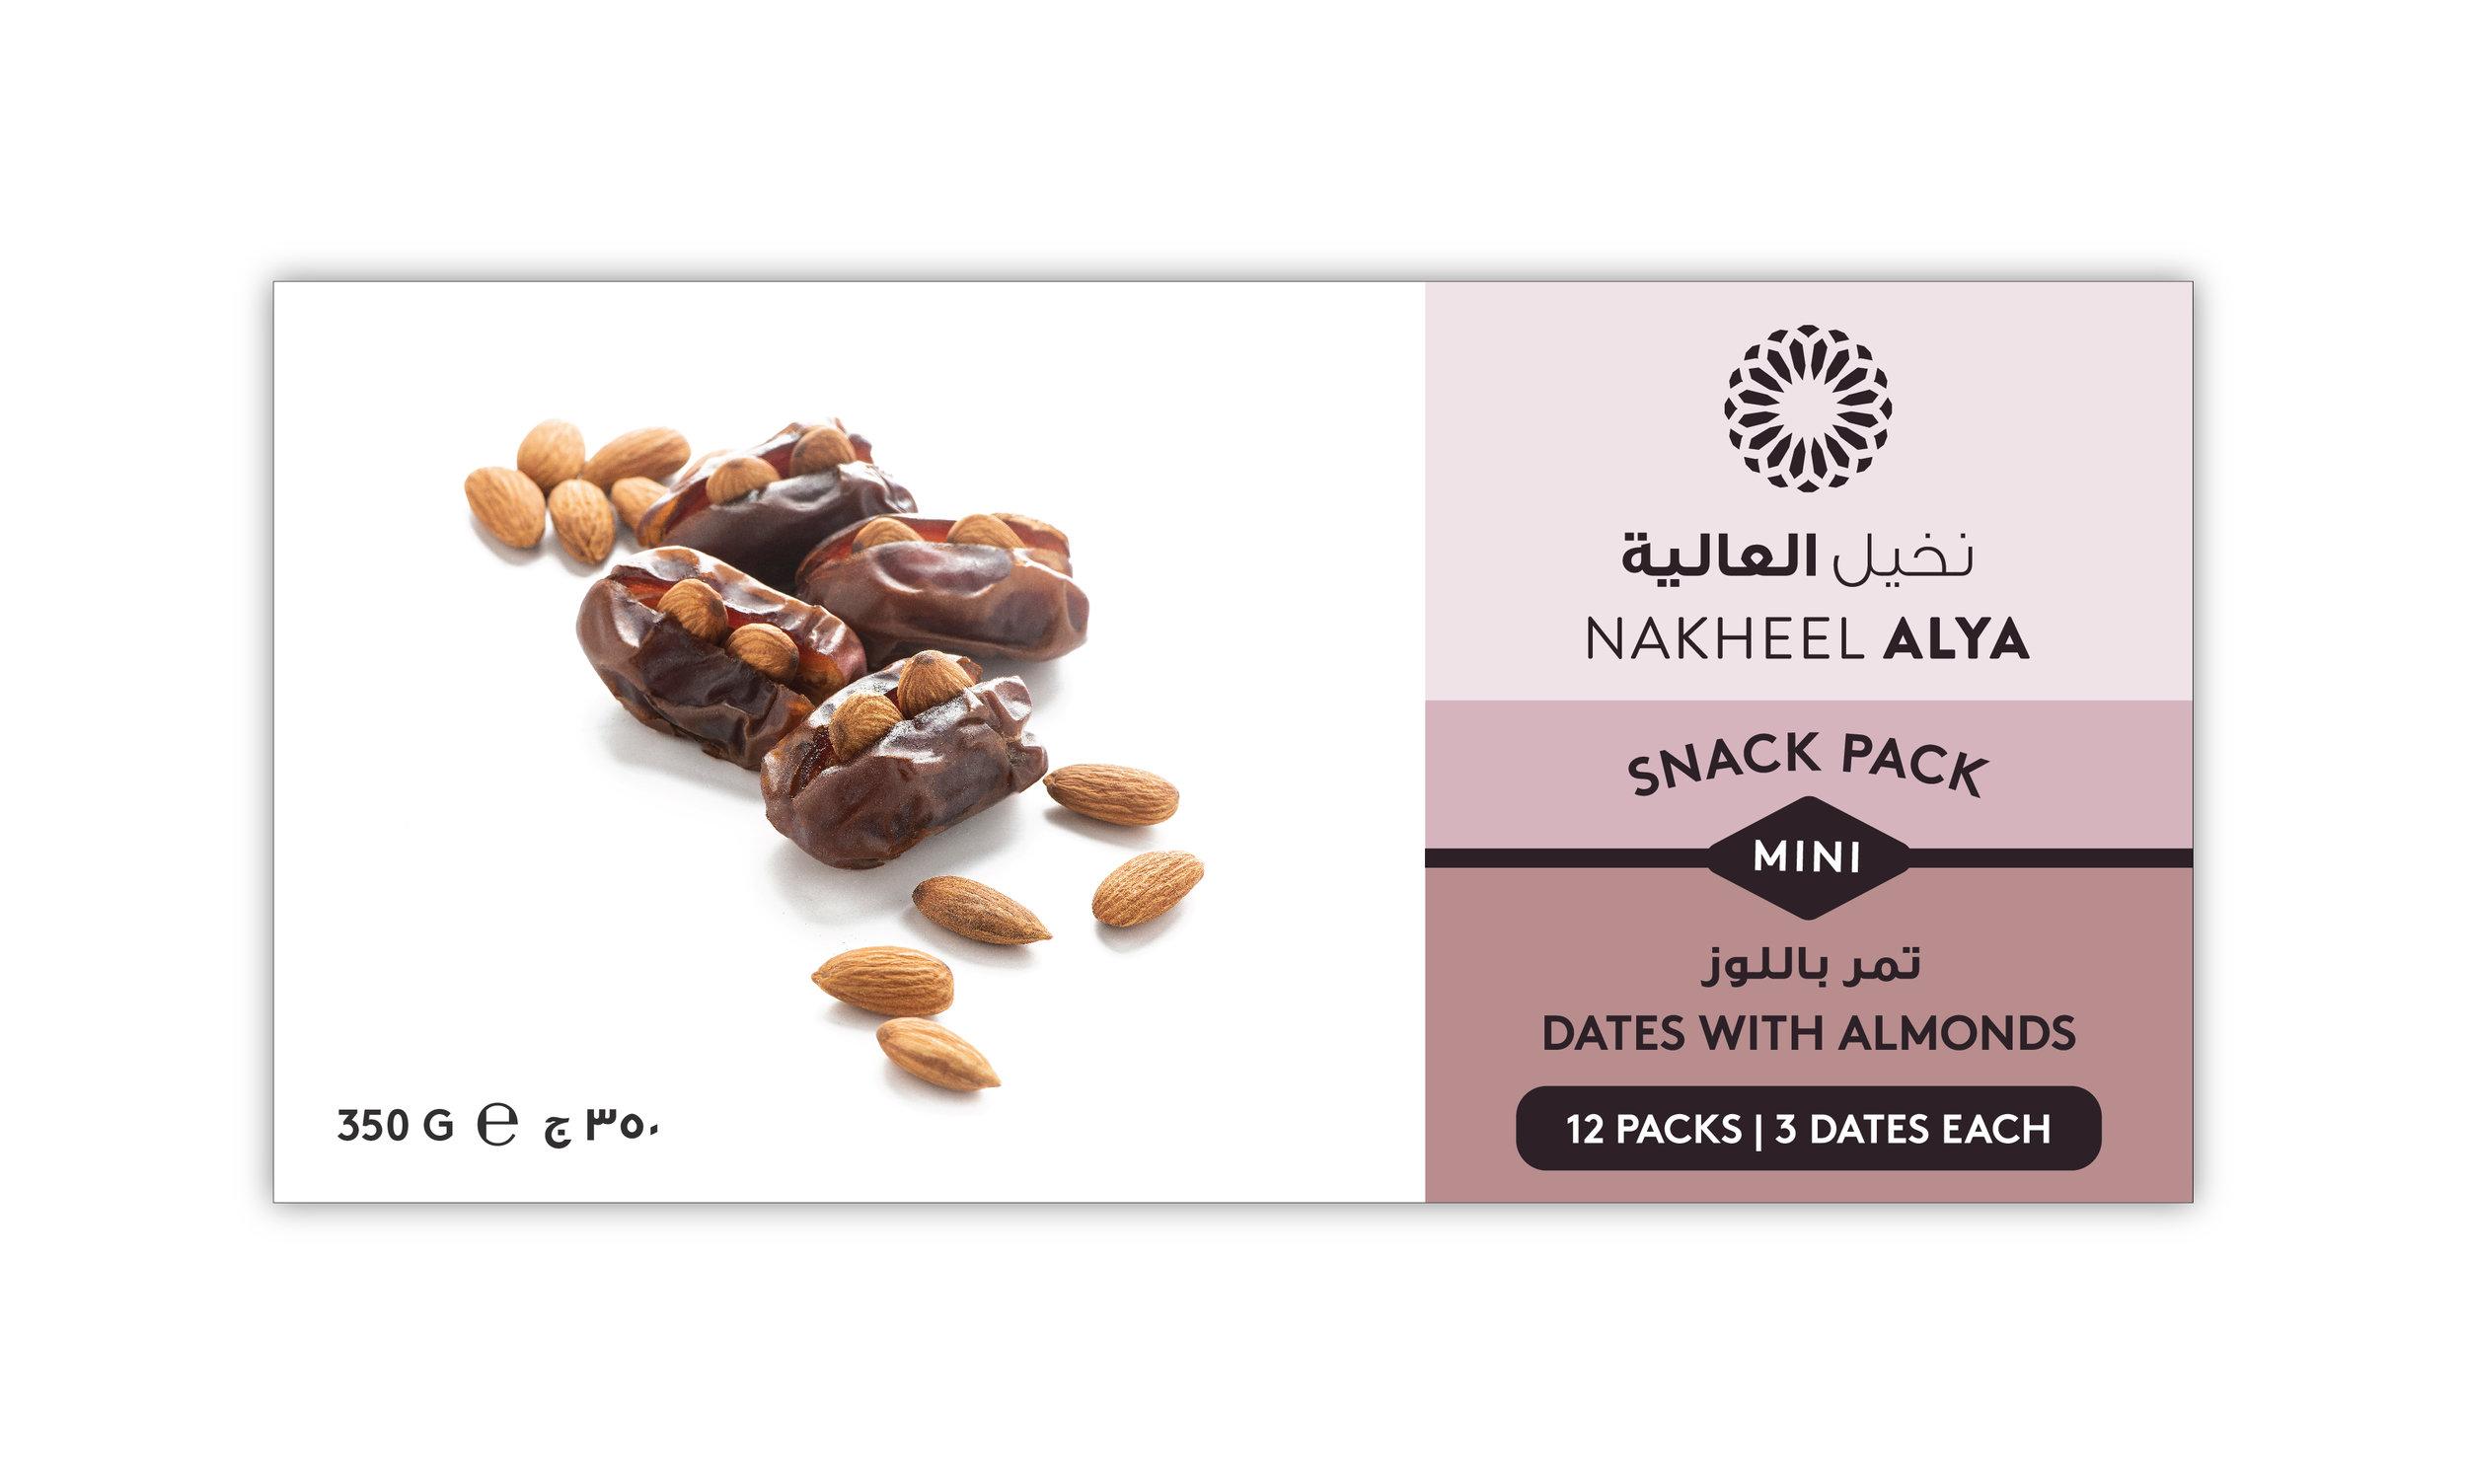 Snack Pack Mini Box_Dates with Almond_WEB.jpg